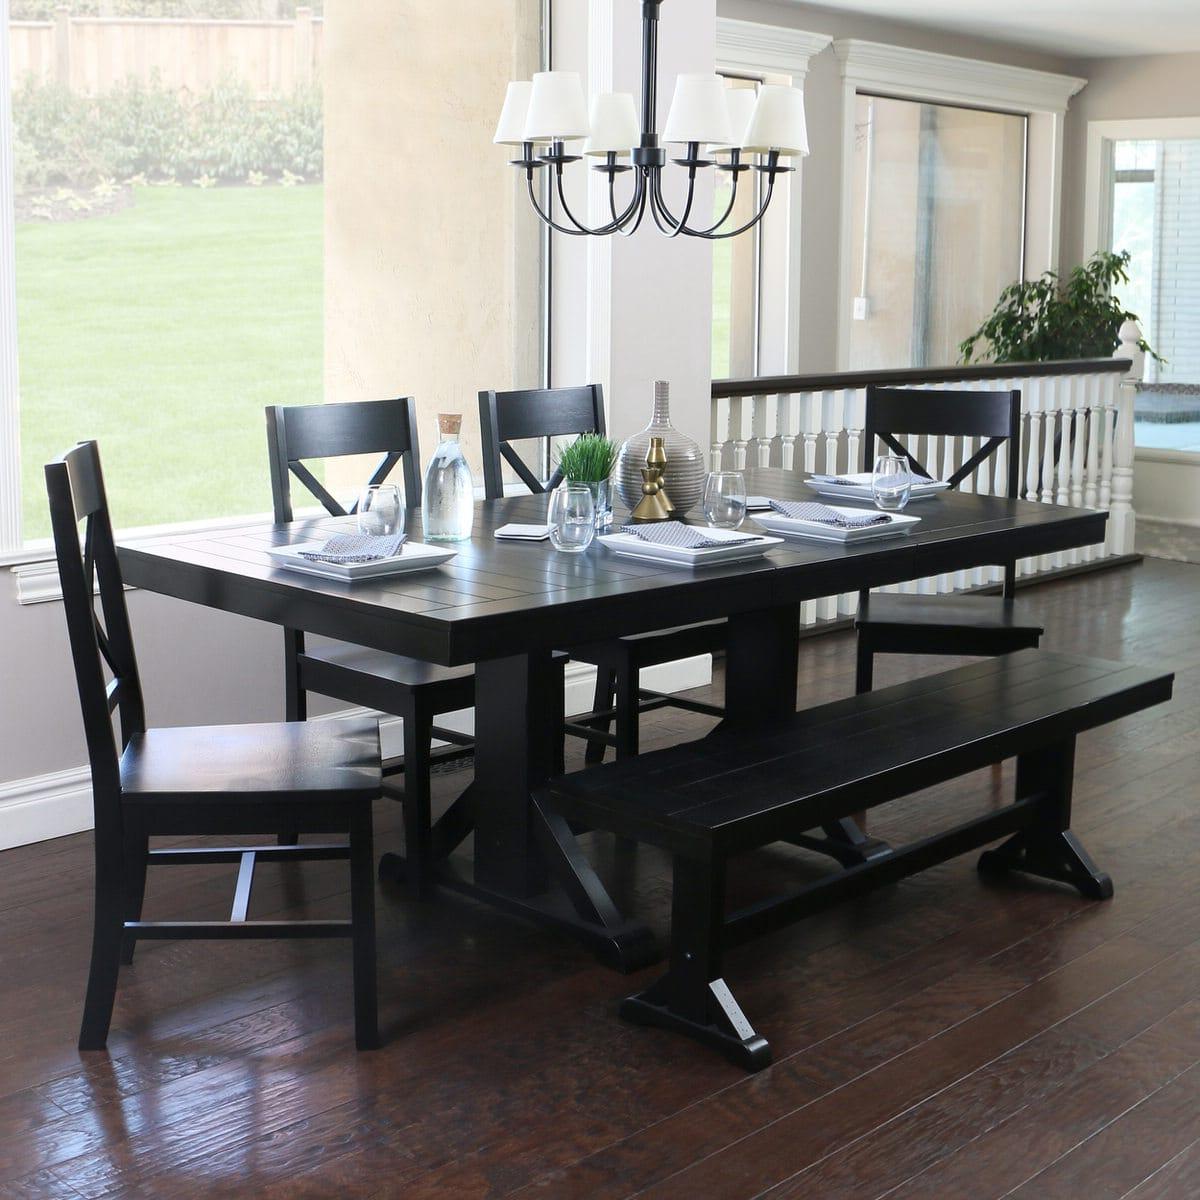 Most Recent Antique Black Wood Kitchen Dining Tables Pertaining To Antique Black Wood 6 Piece Dining Kitchen Setwalker Edison (View 19 of 30)